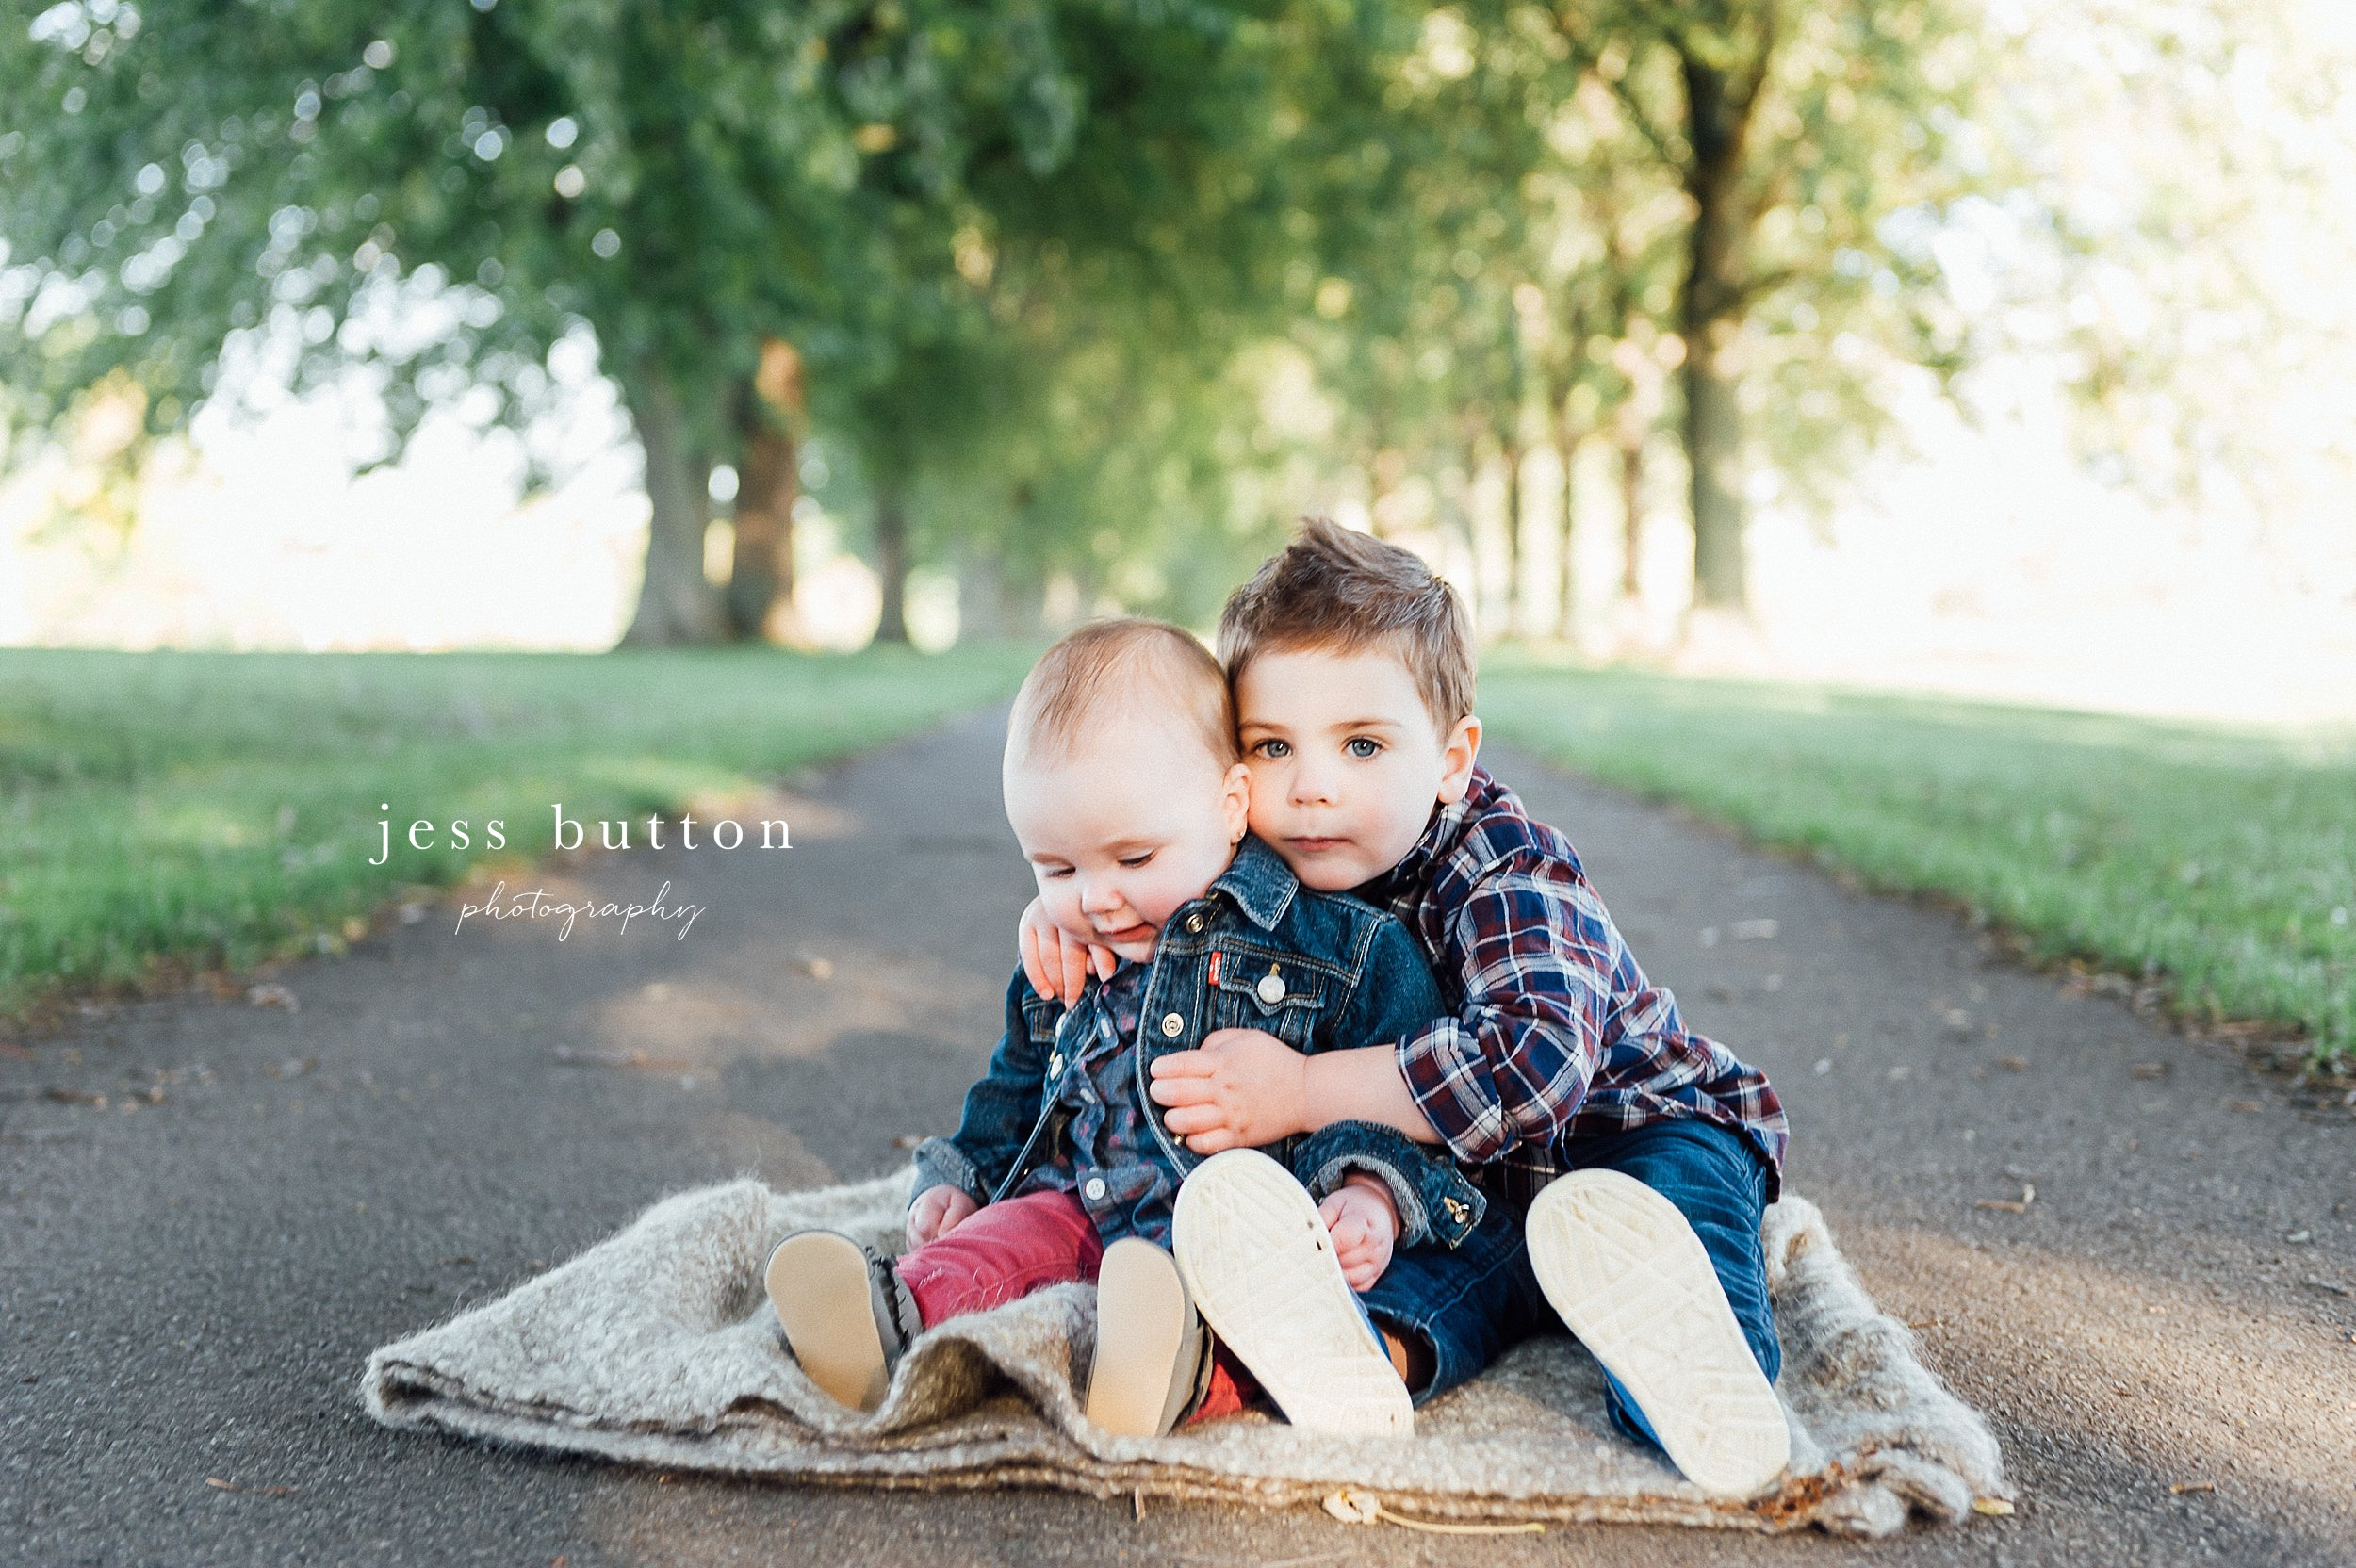 Niagara Family Photographer - Fall family portraits Niagara-on-the-Lake - brother and sister sitting together on path